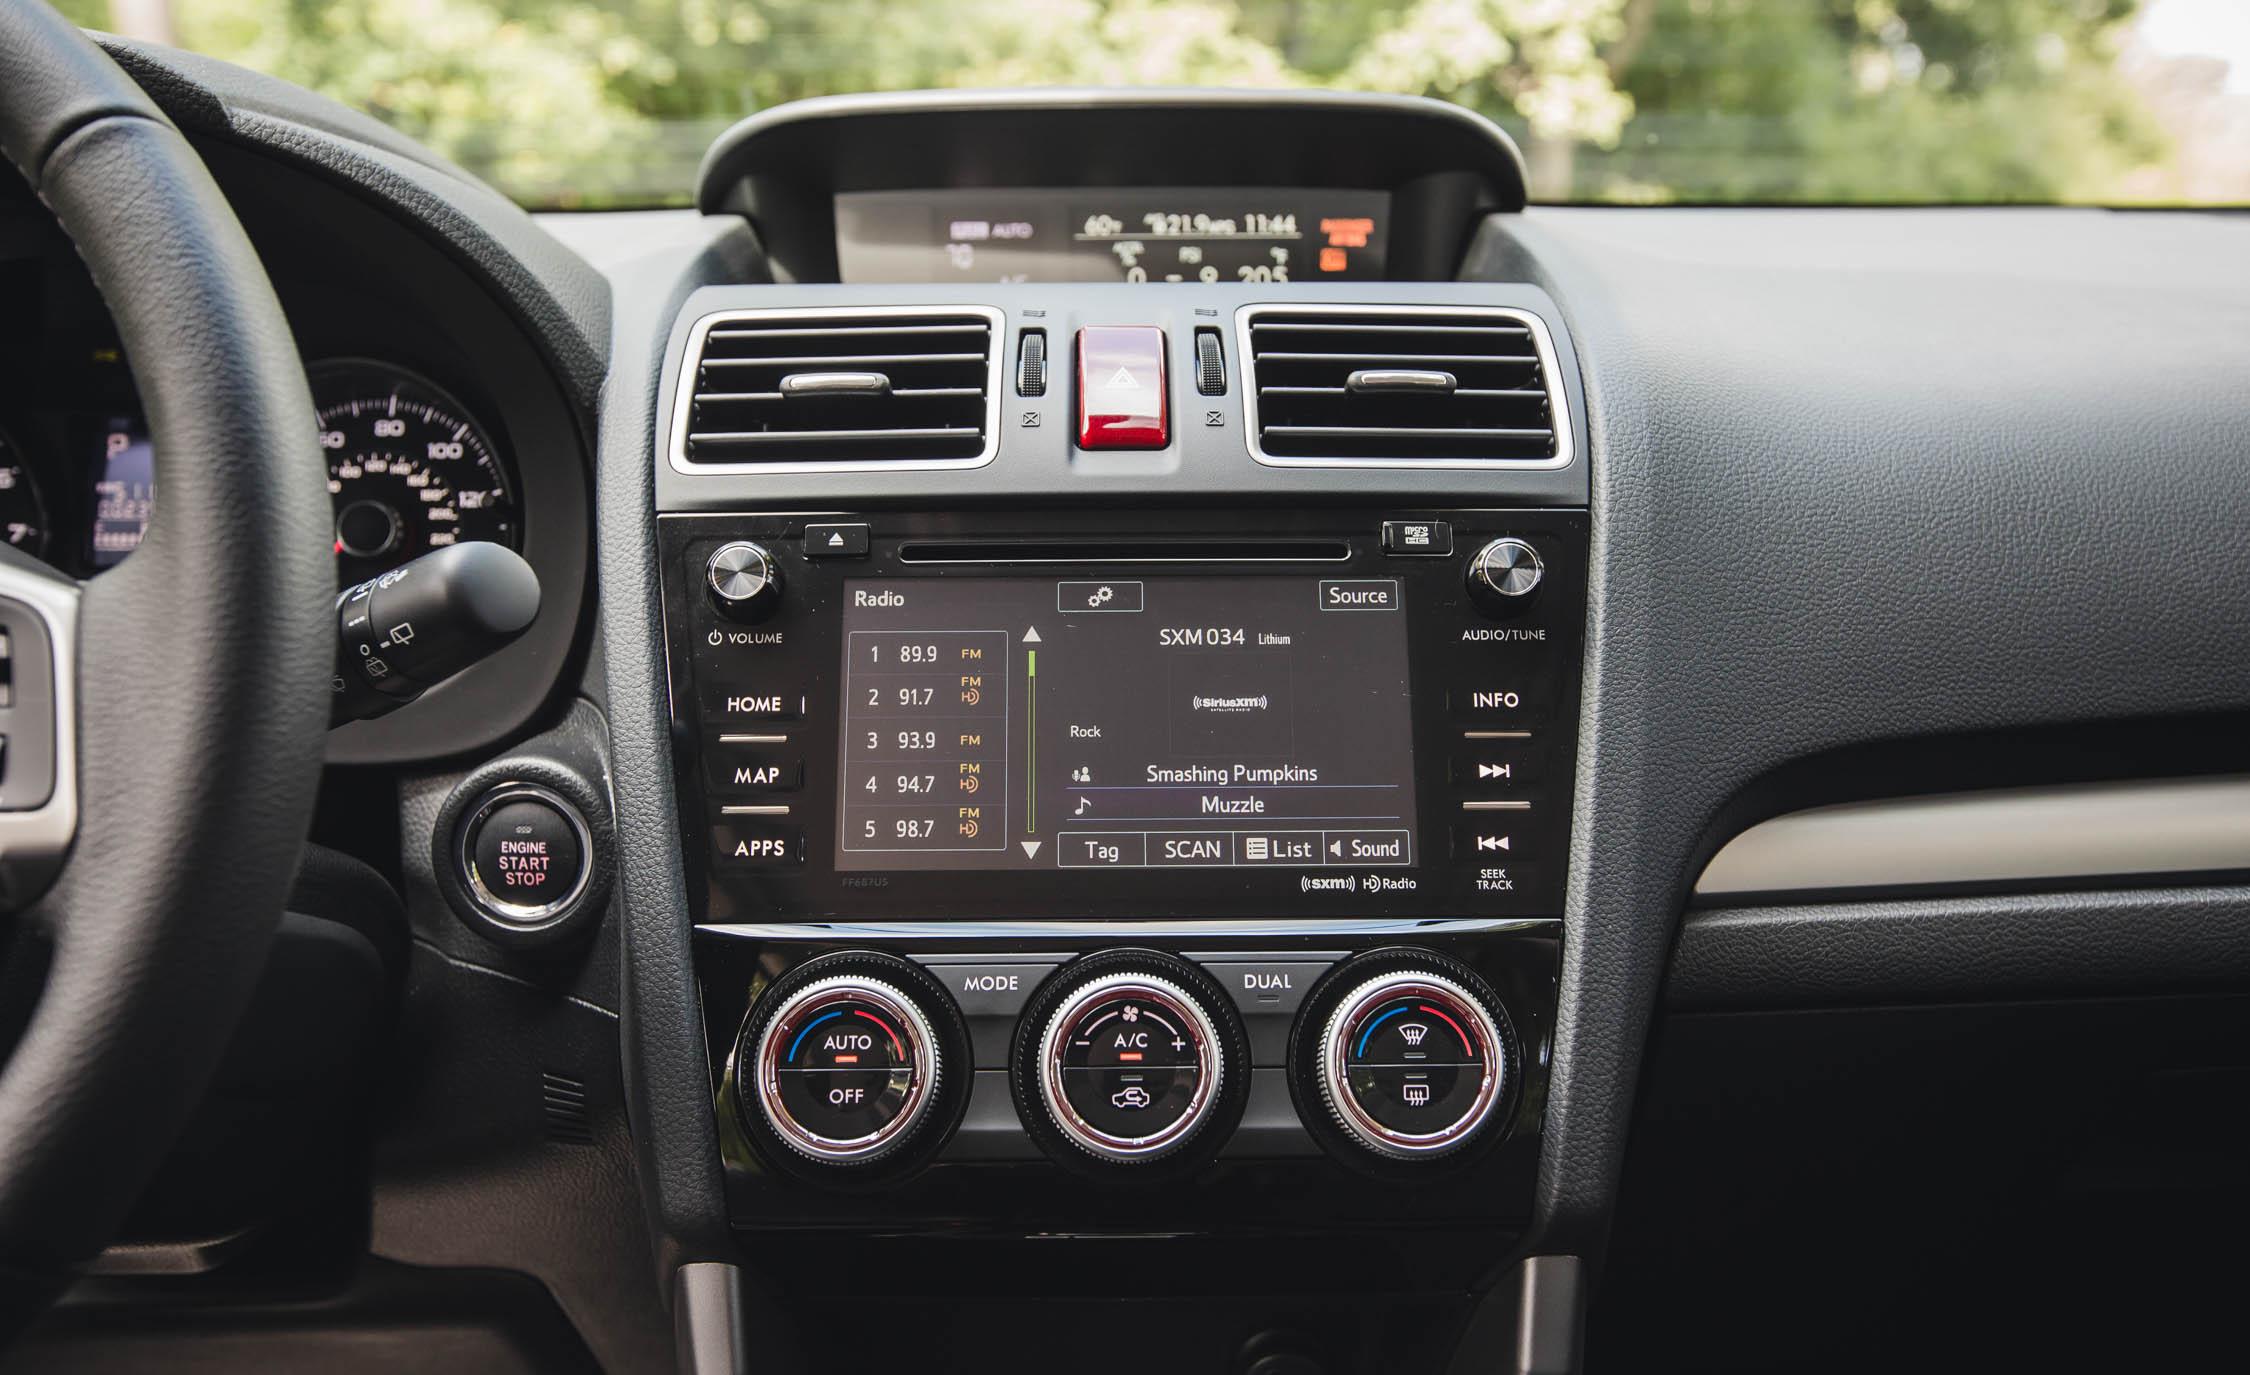 2016 Subaru Forester 2.0XT Touring Interior Center Head Unit